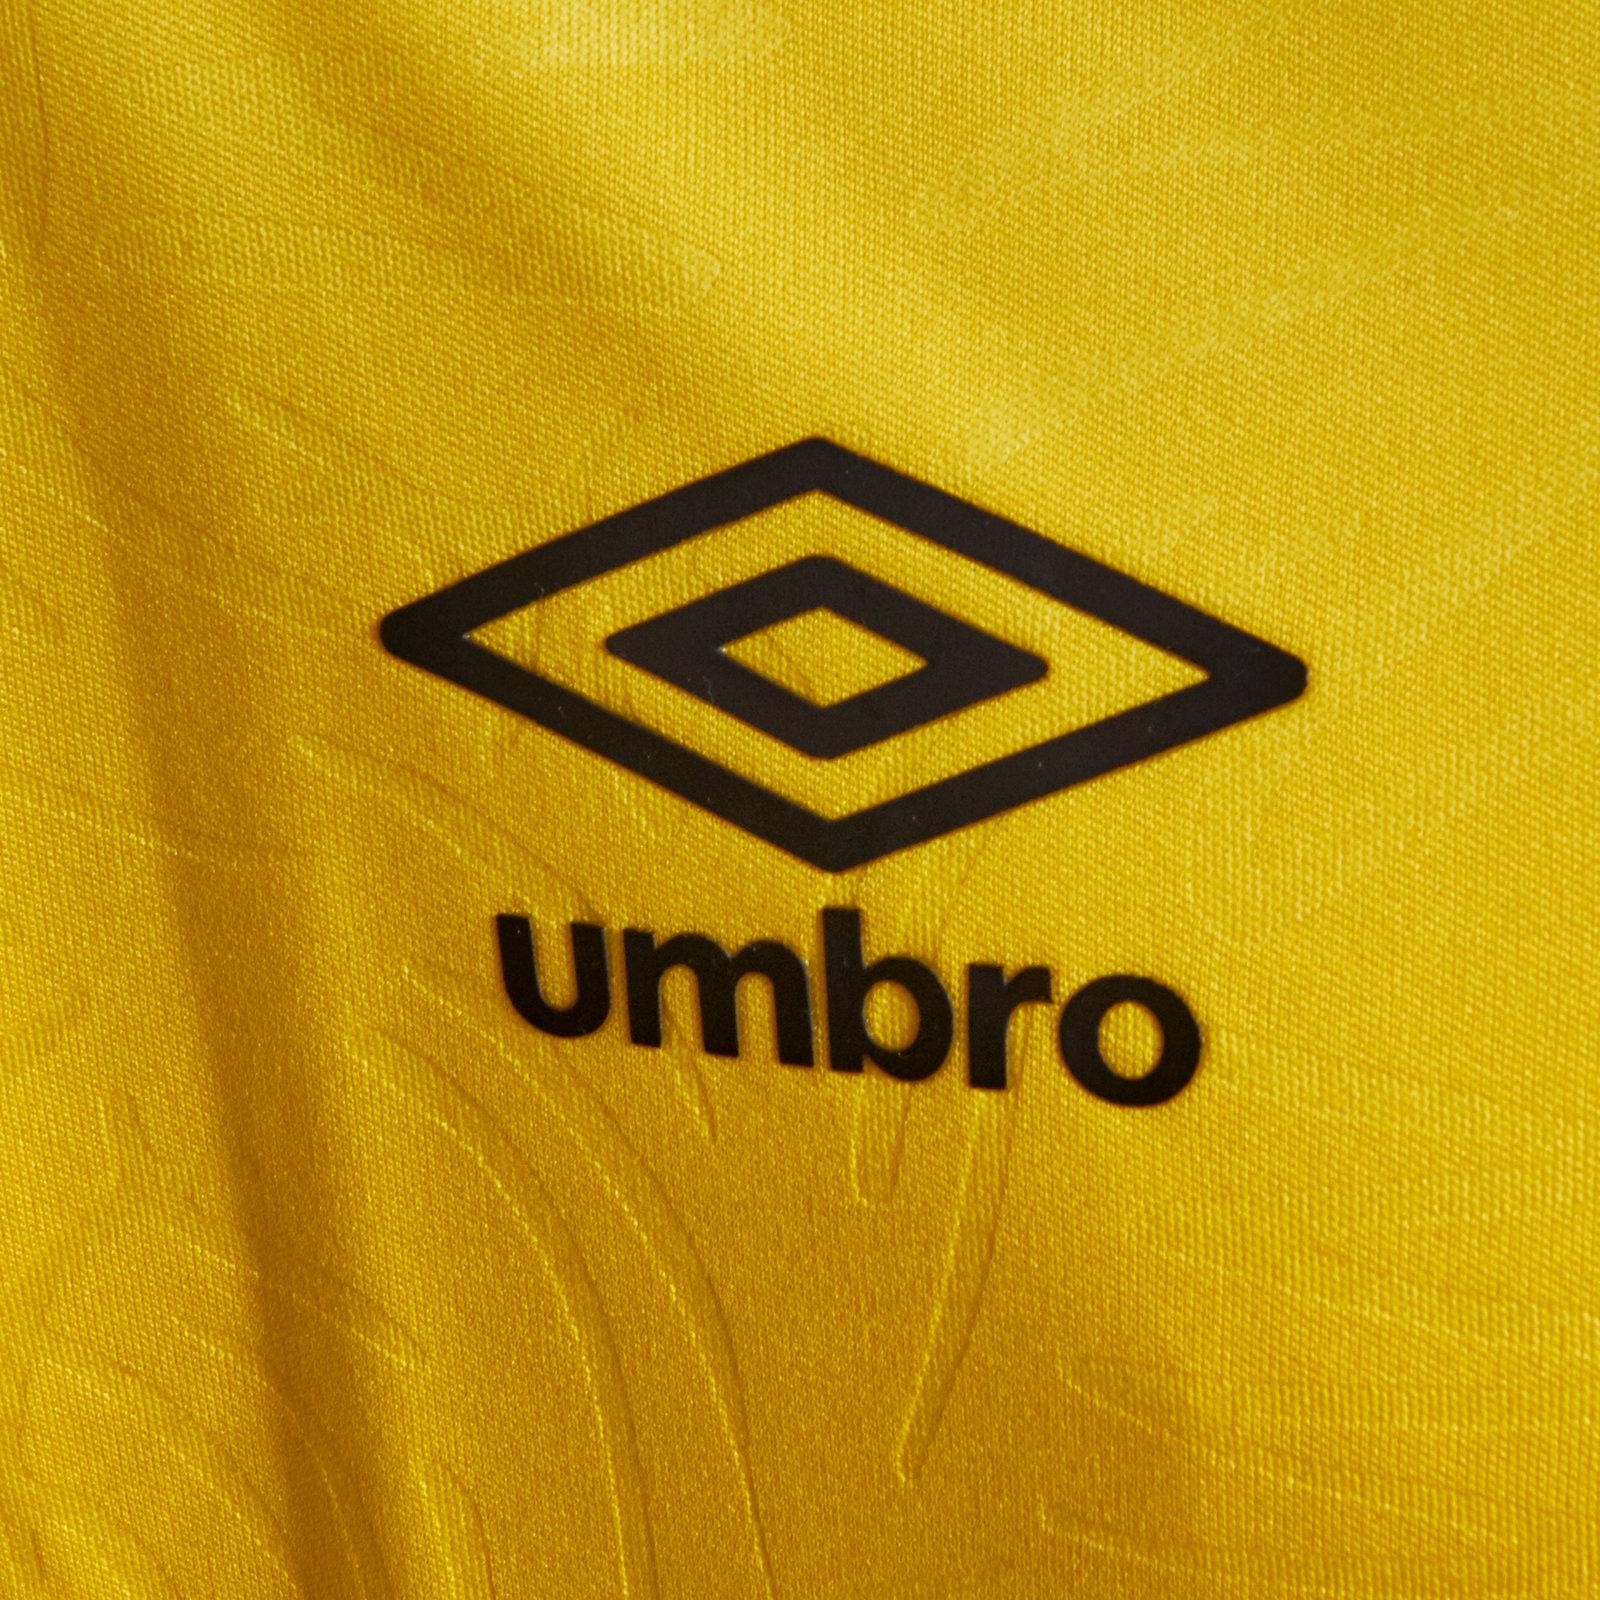 Umbro Jamaica 2018 Home Kids Short Sleeve Replica Football Shirt Yellow